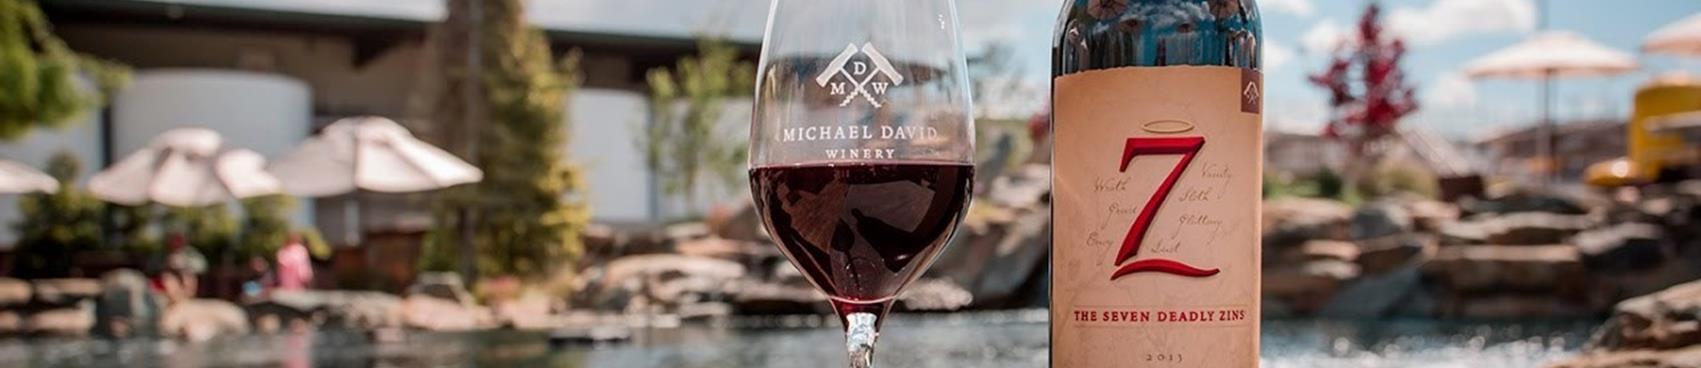 A image of Michael David Winery